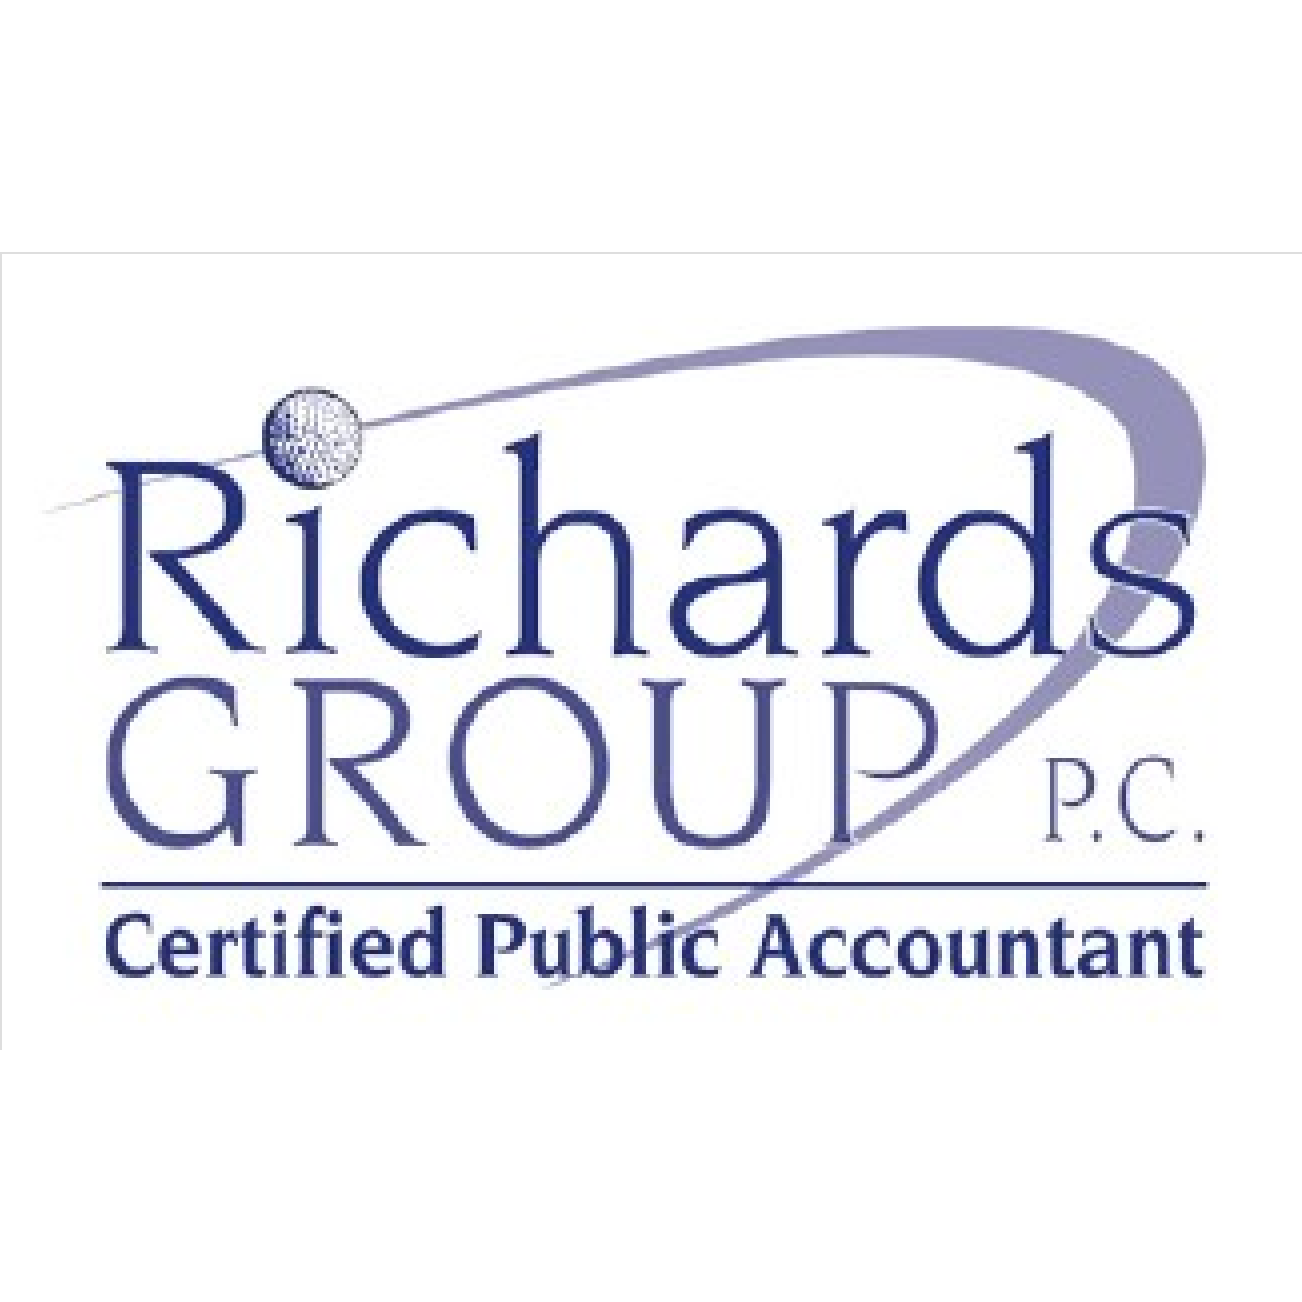 Richards Group P.C., CPA image 1